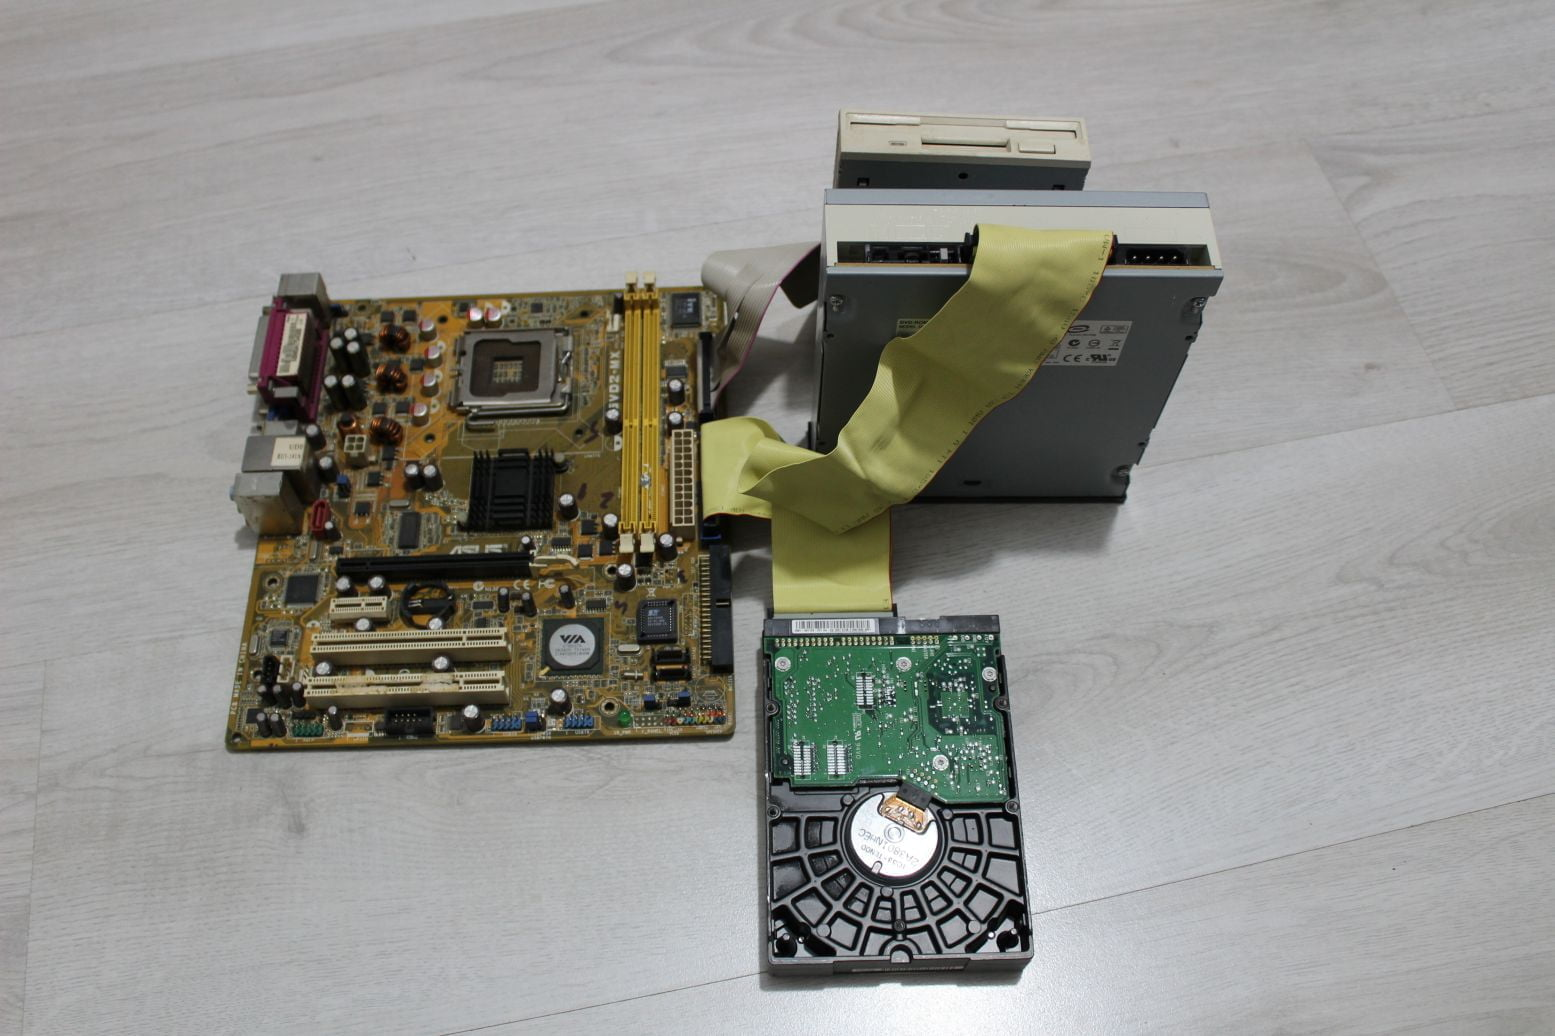 informatica placa de baza hdd cd rom informatica Informatica sau Tehnologia informatiei si a comunicațiilor va fi cea mai importanta materie scolara începând din 2020 informatica placa de baza hdd cd rom